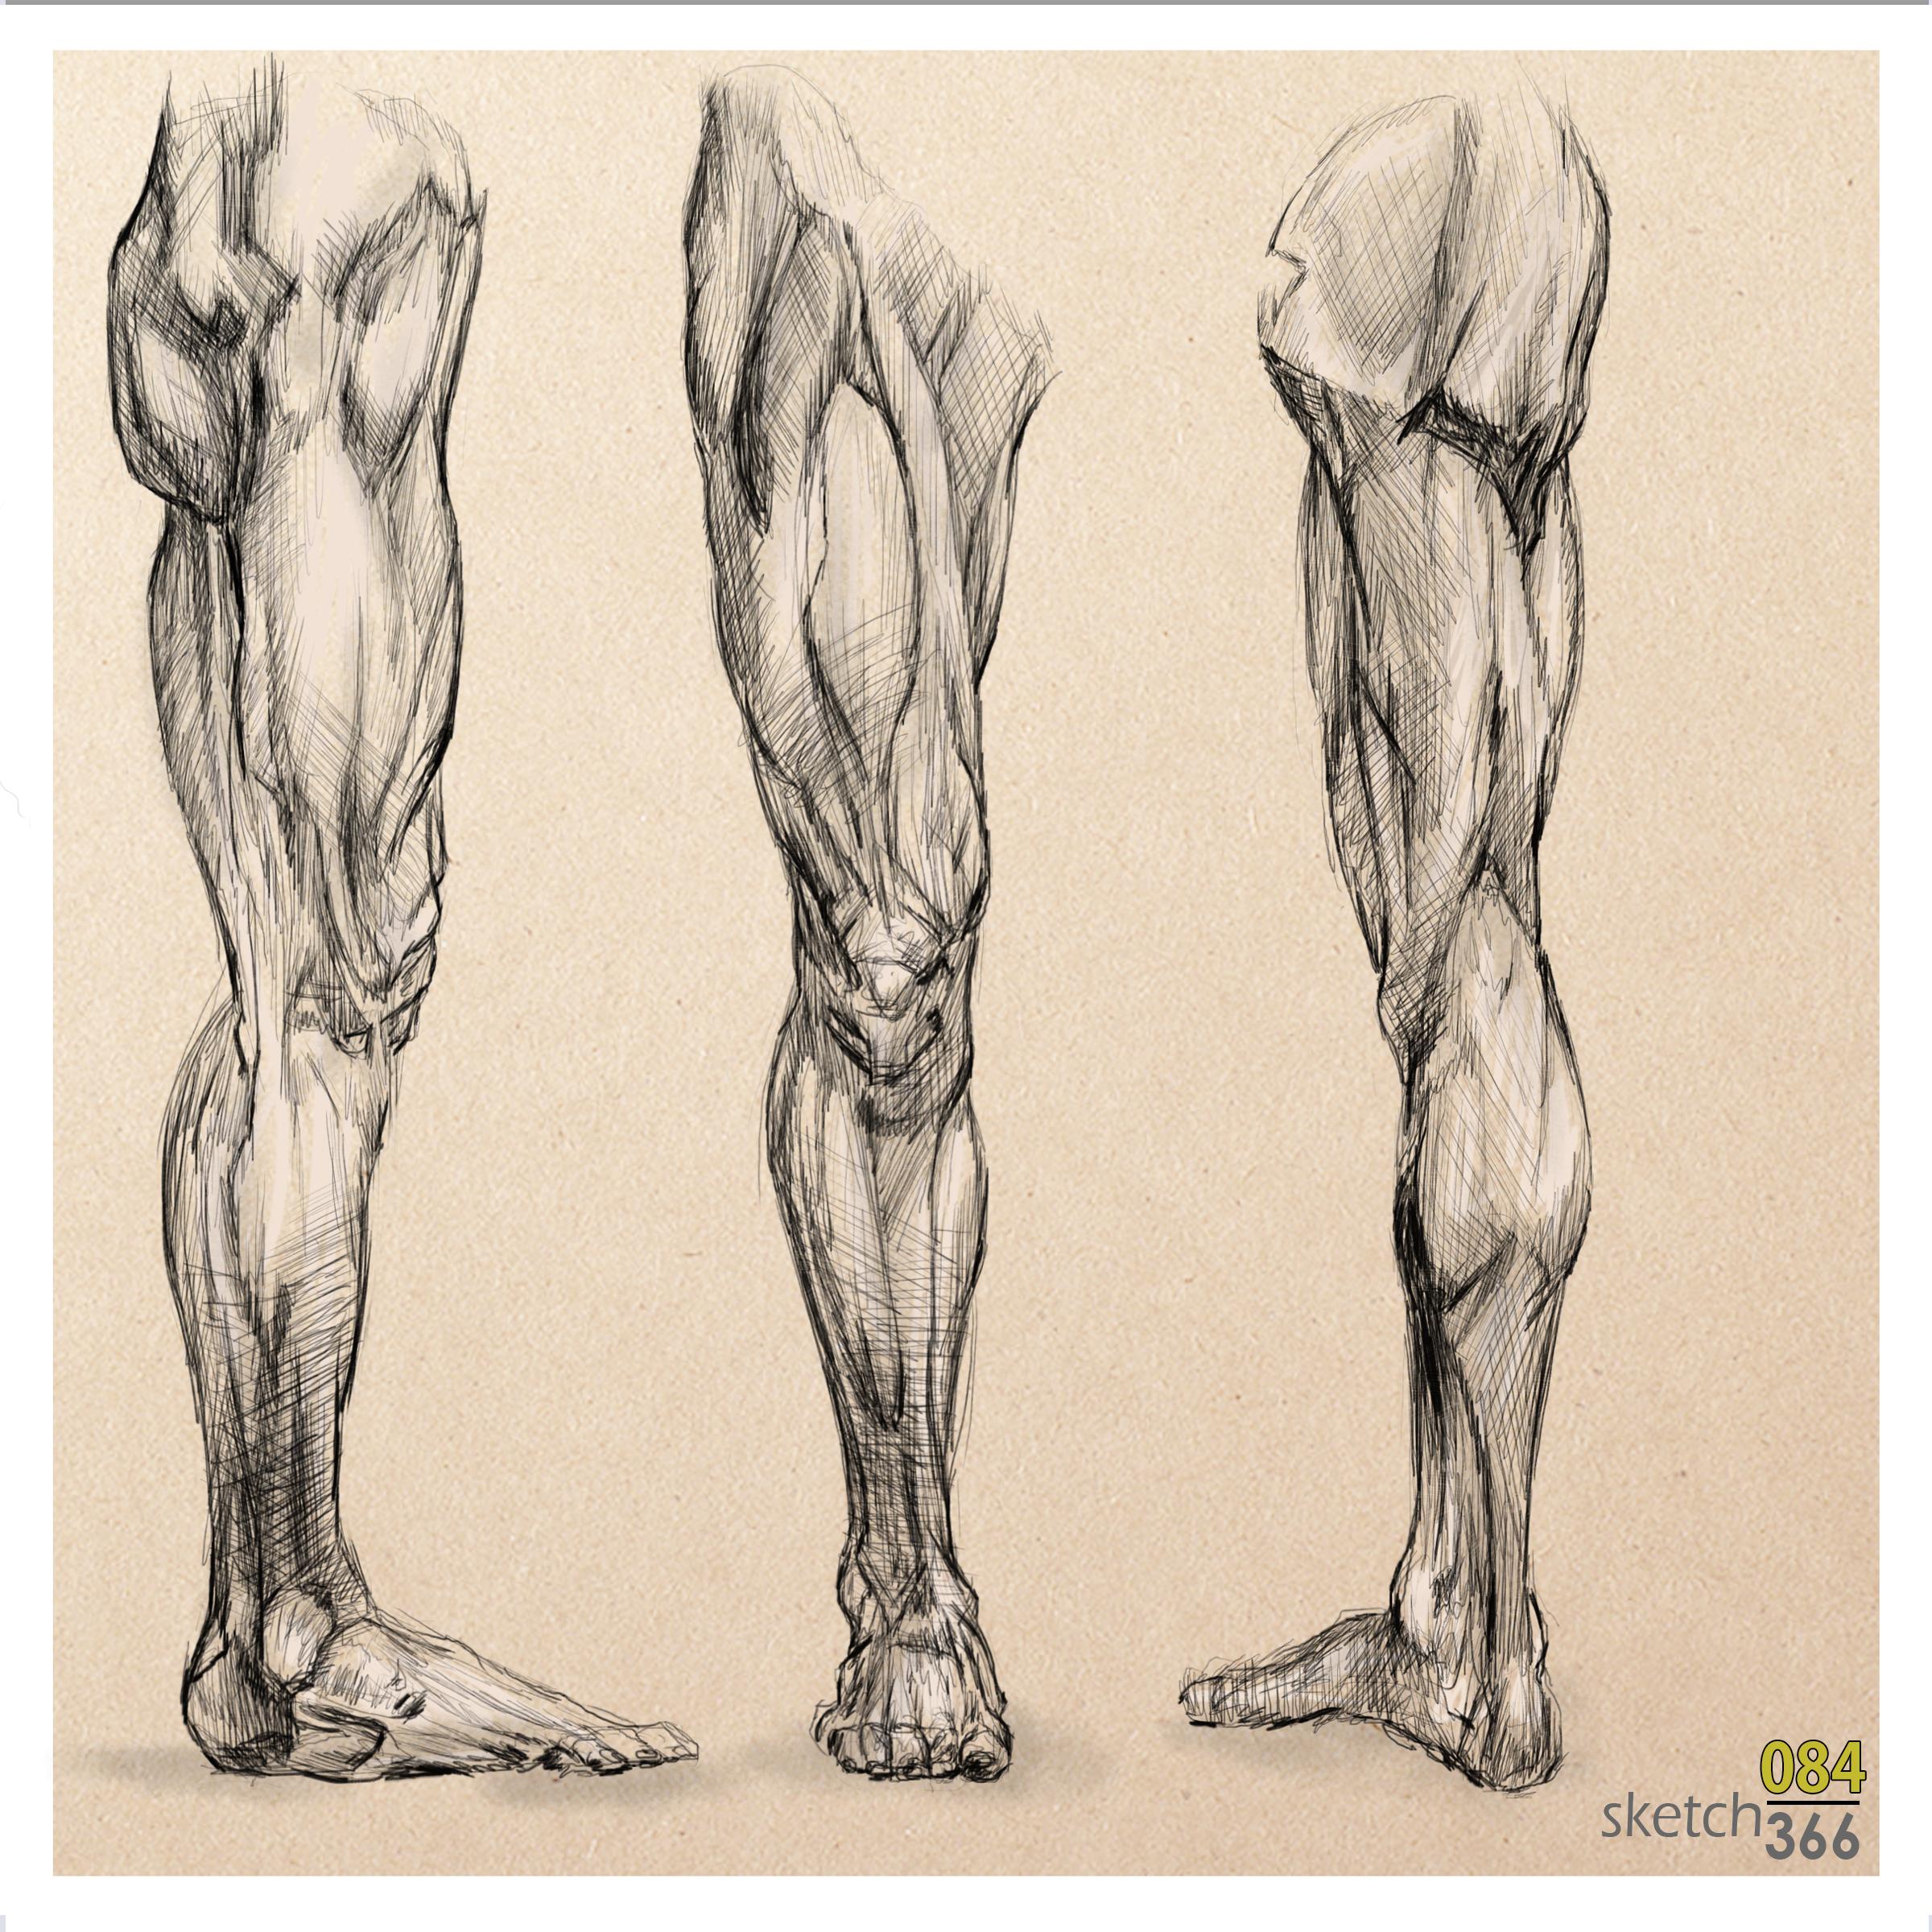 leg study - digital pen and ink